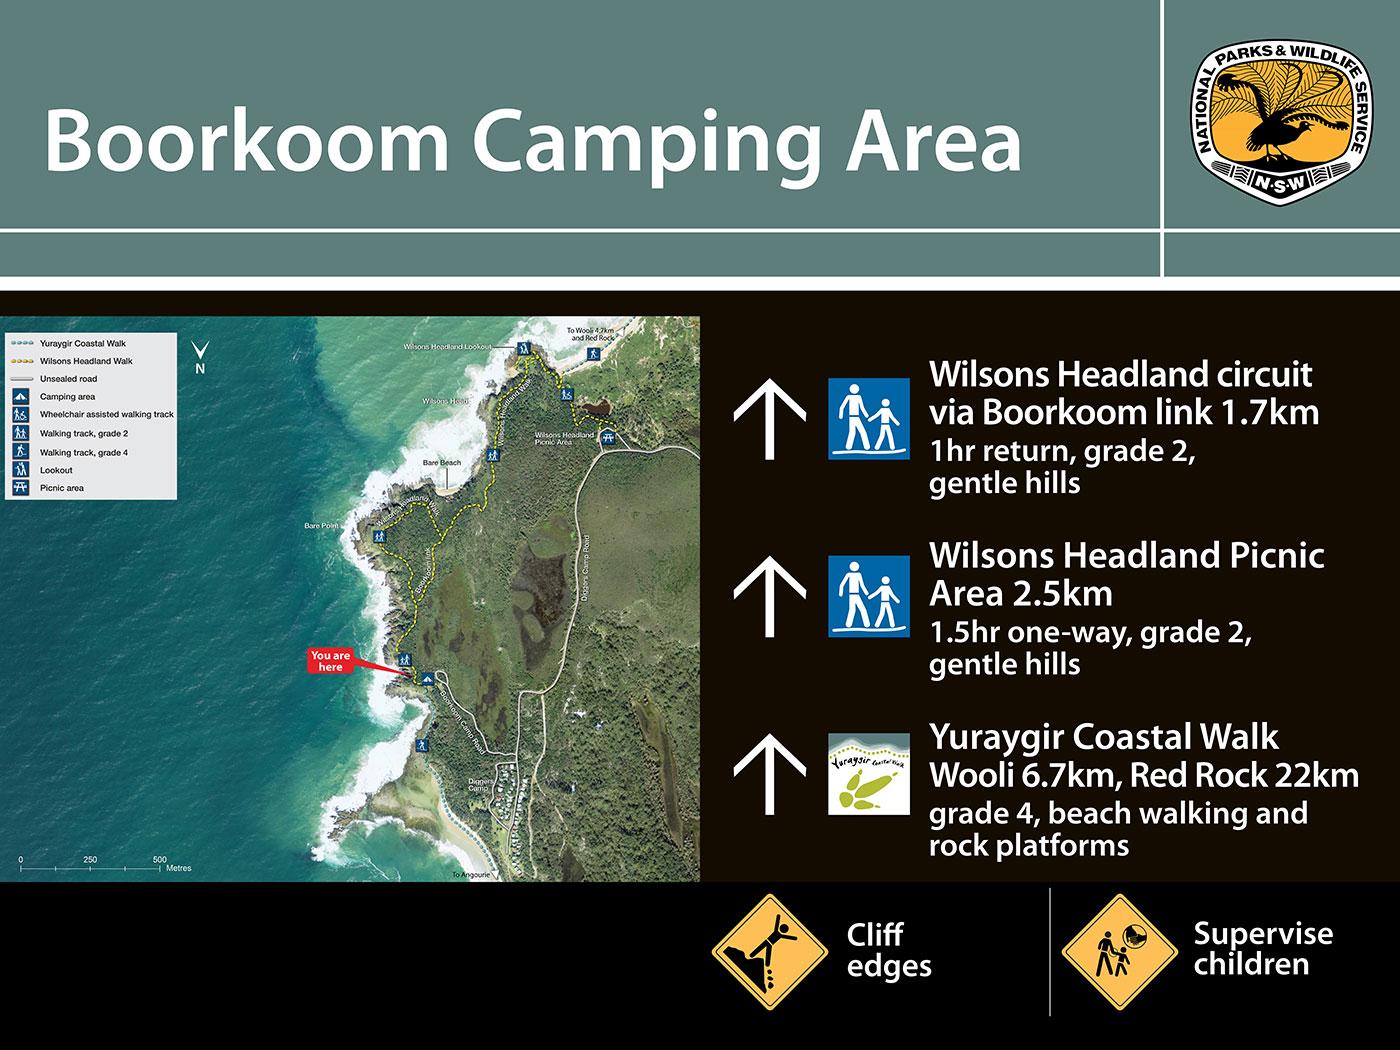 Boorkoom Camping Area trackhead sign